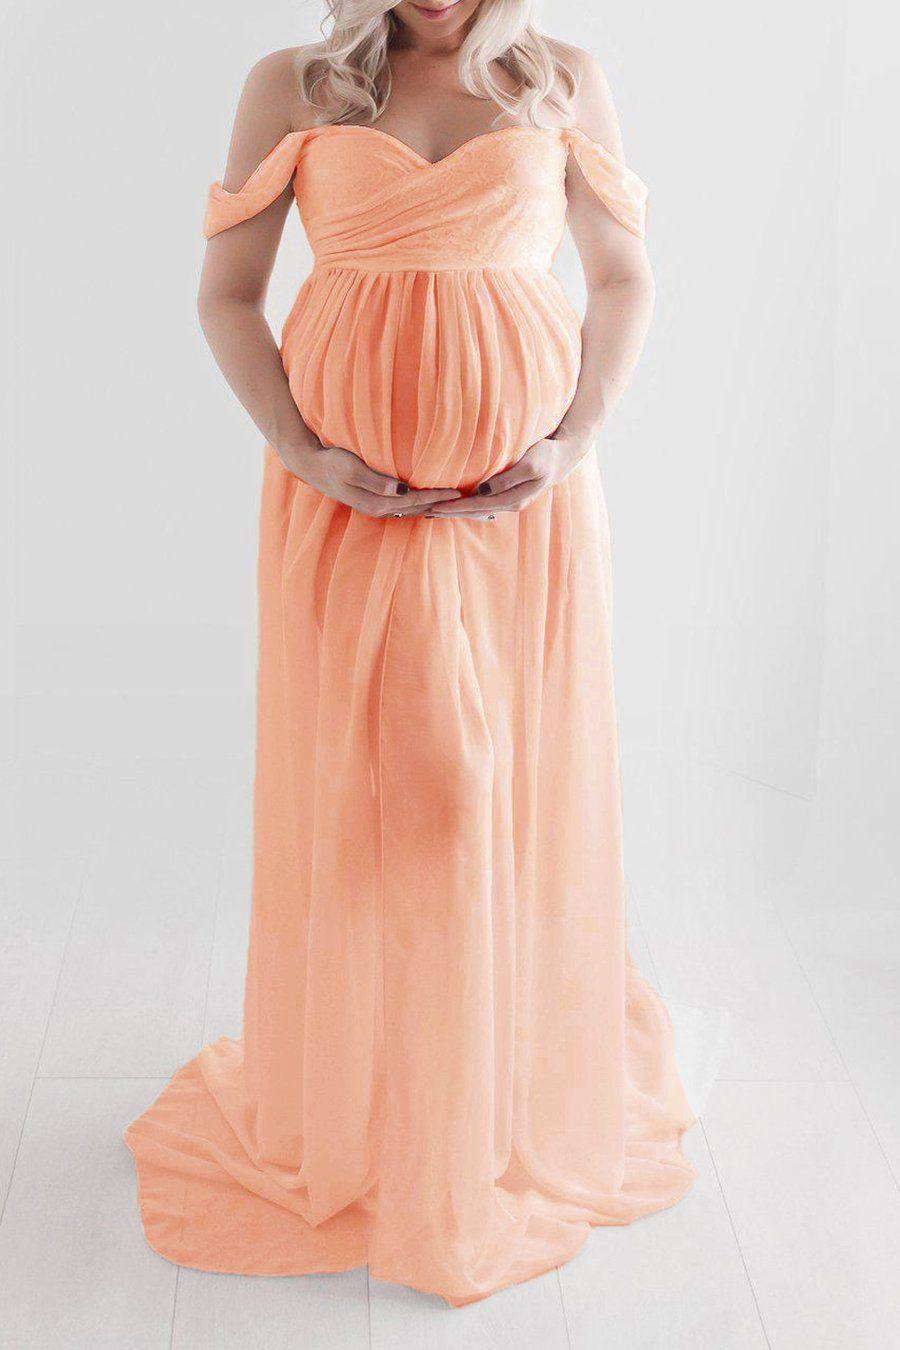 Umstandsmode Elegantes schulterfreies Maxikleid   – Maternity photo ideas